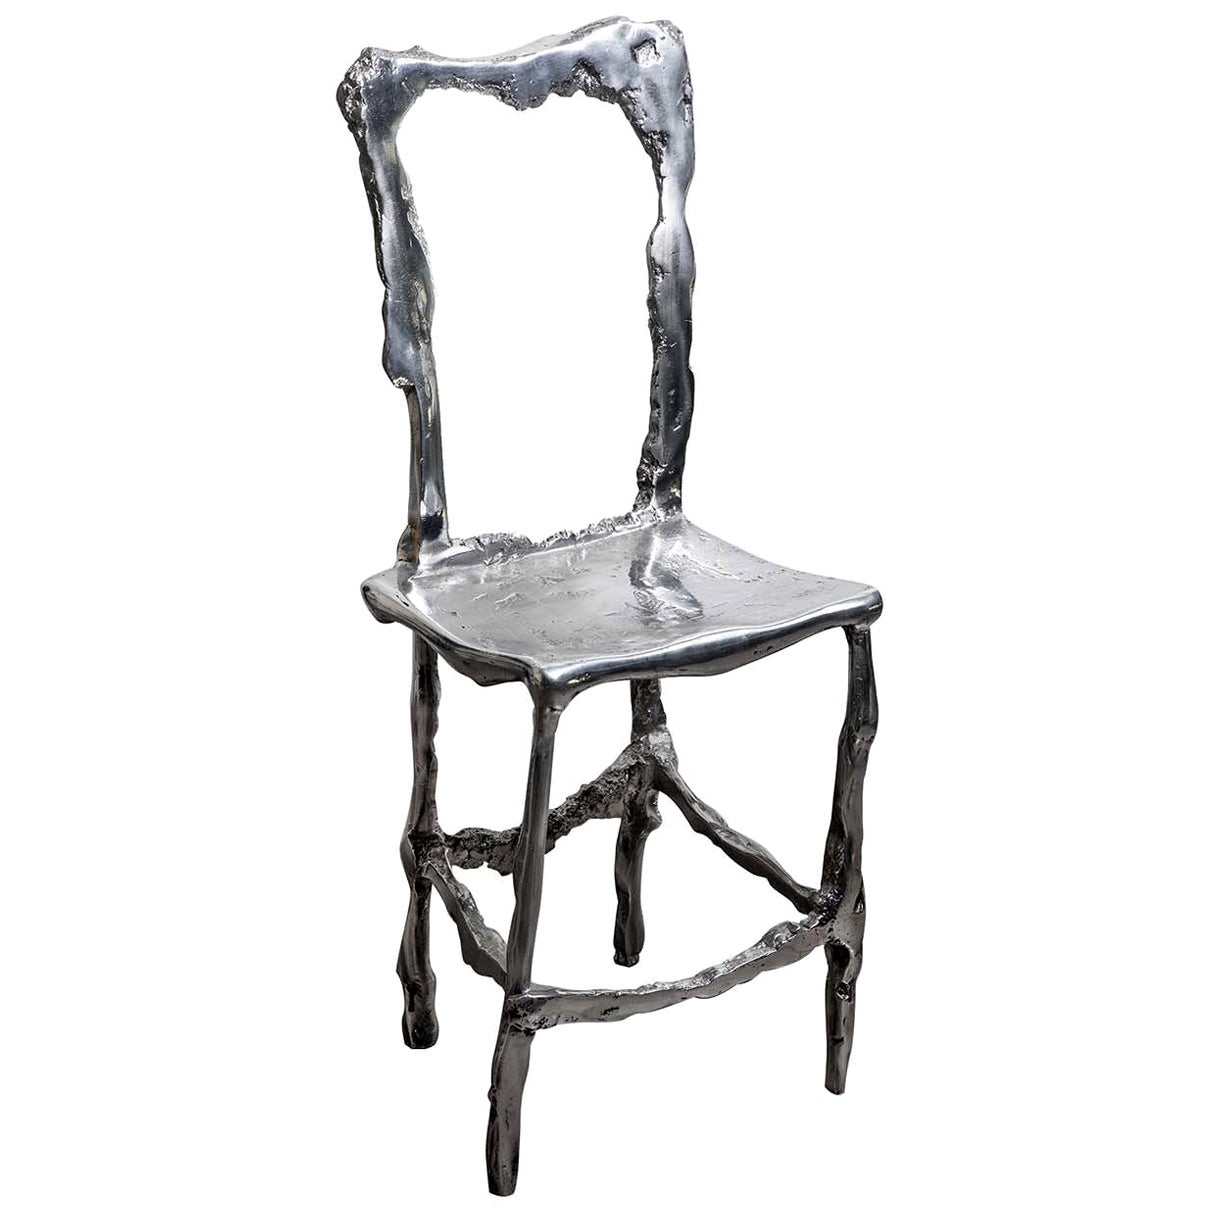 Cast Aluminum Scultura Decorative Chair